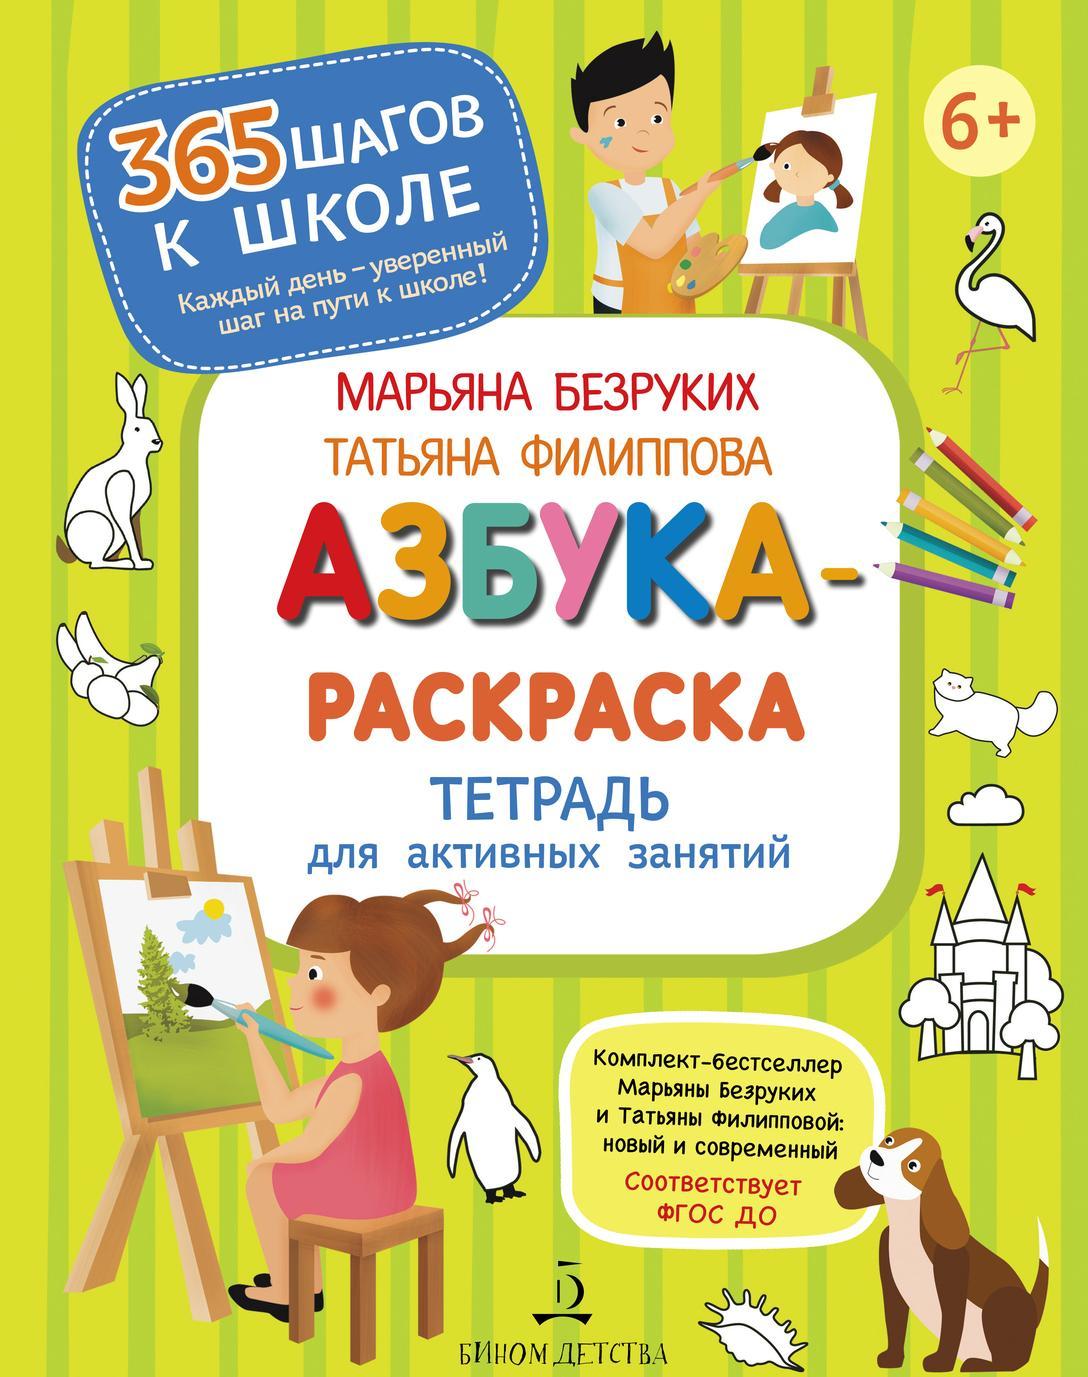 Azbuka-Raskraska. Tetrad dlja aktivnykh zanjatij | Bezrukikh Marjana Mikhajlovna, Filippova Tatjana Andreevna